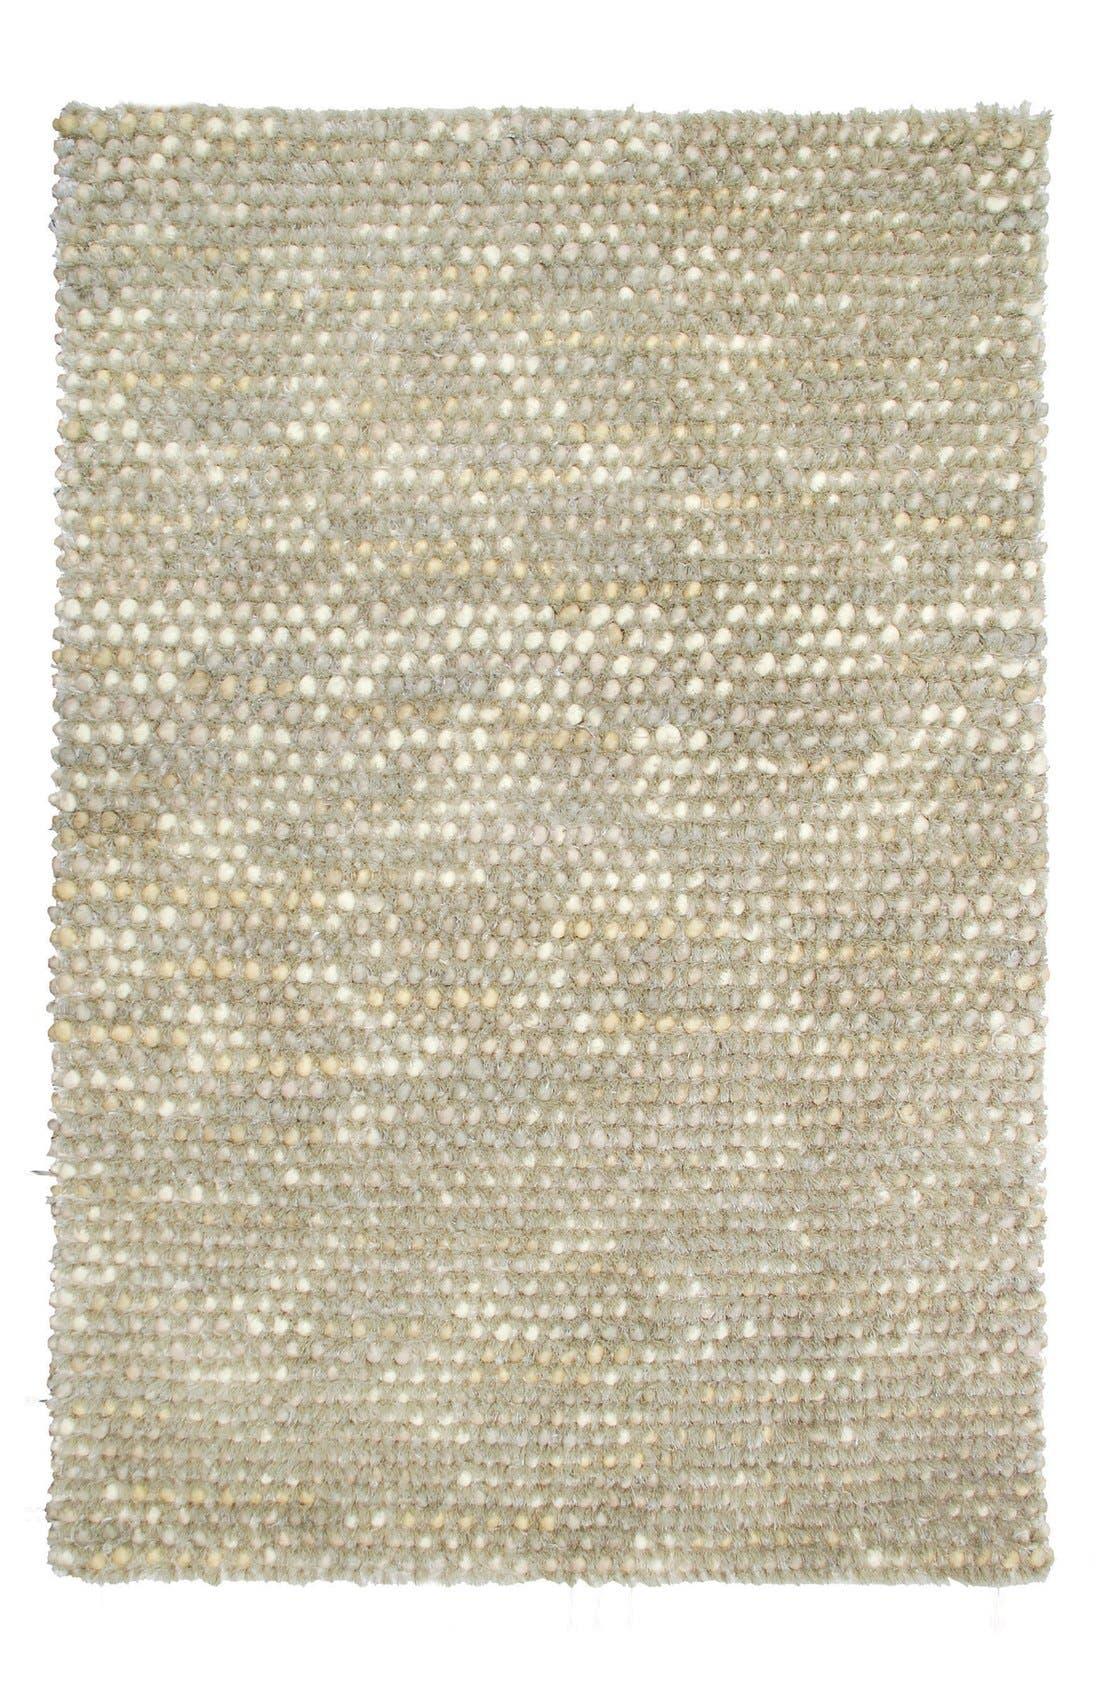 Alternate Image 1 Selected - Villa Home Collection Pebble Shag Rug